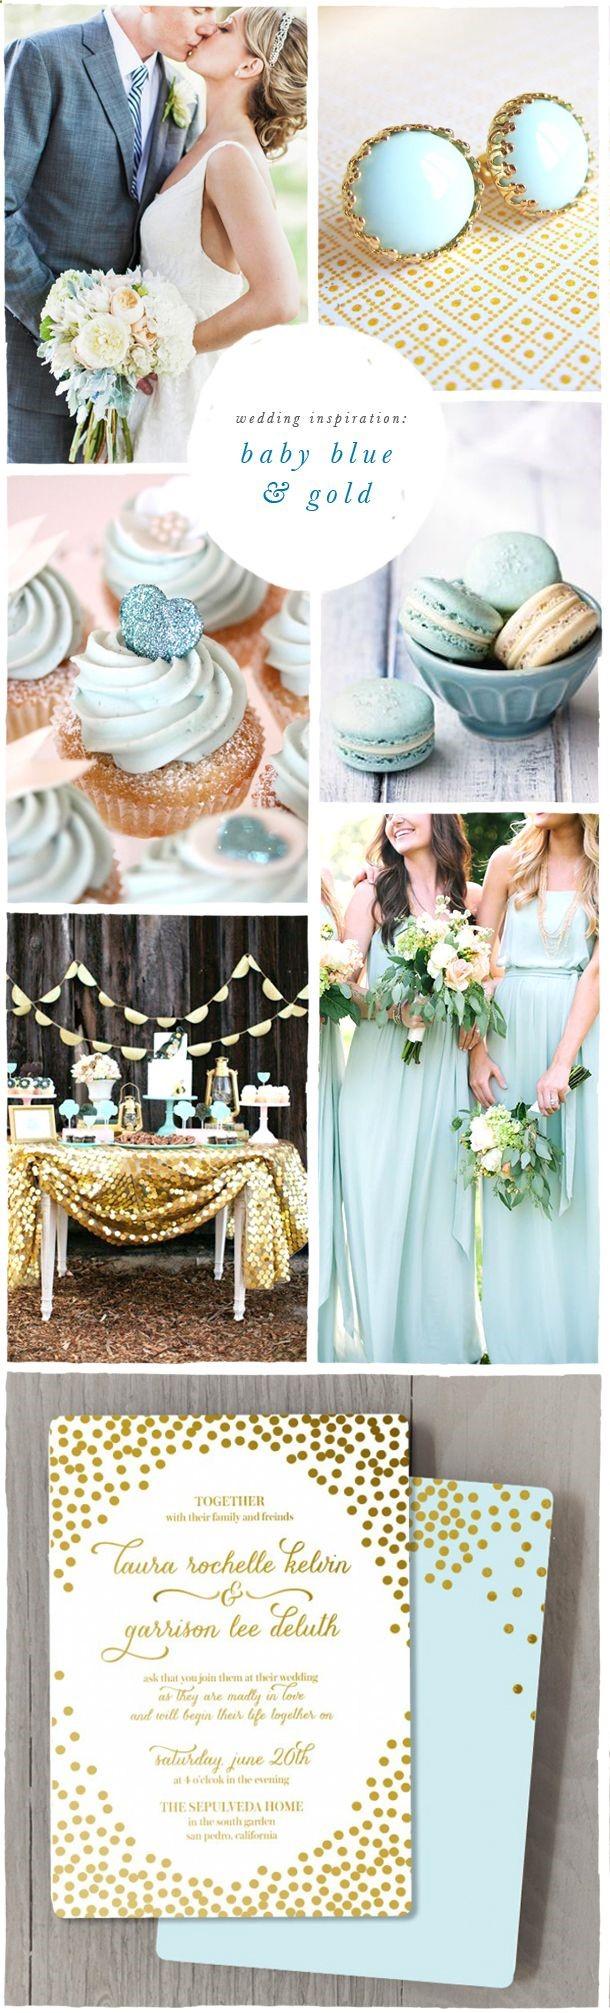 Blue Gold Wedding Inspiration Smitten On Paper Purveyors Of